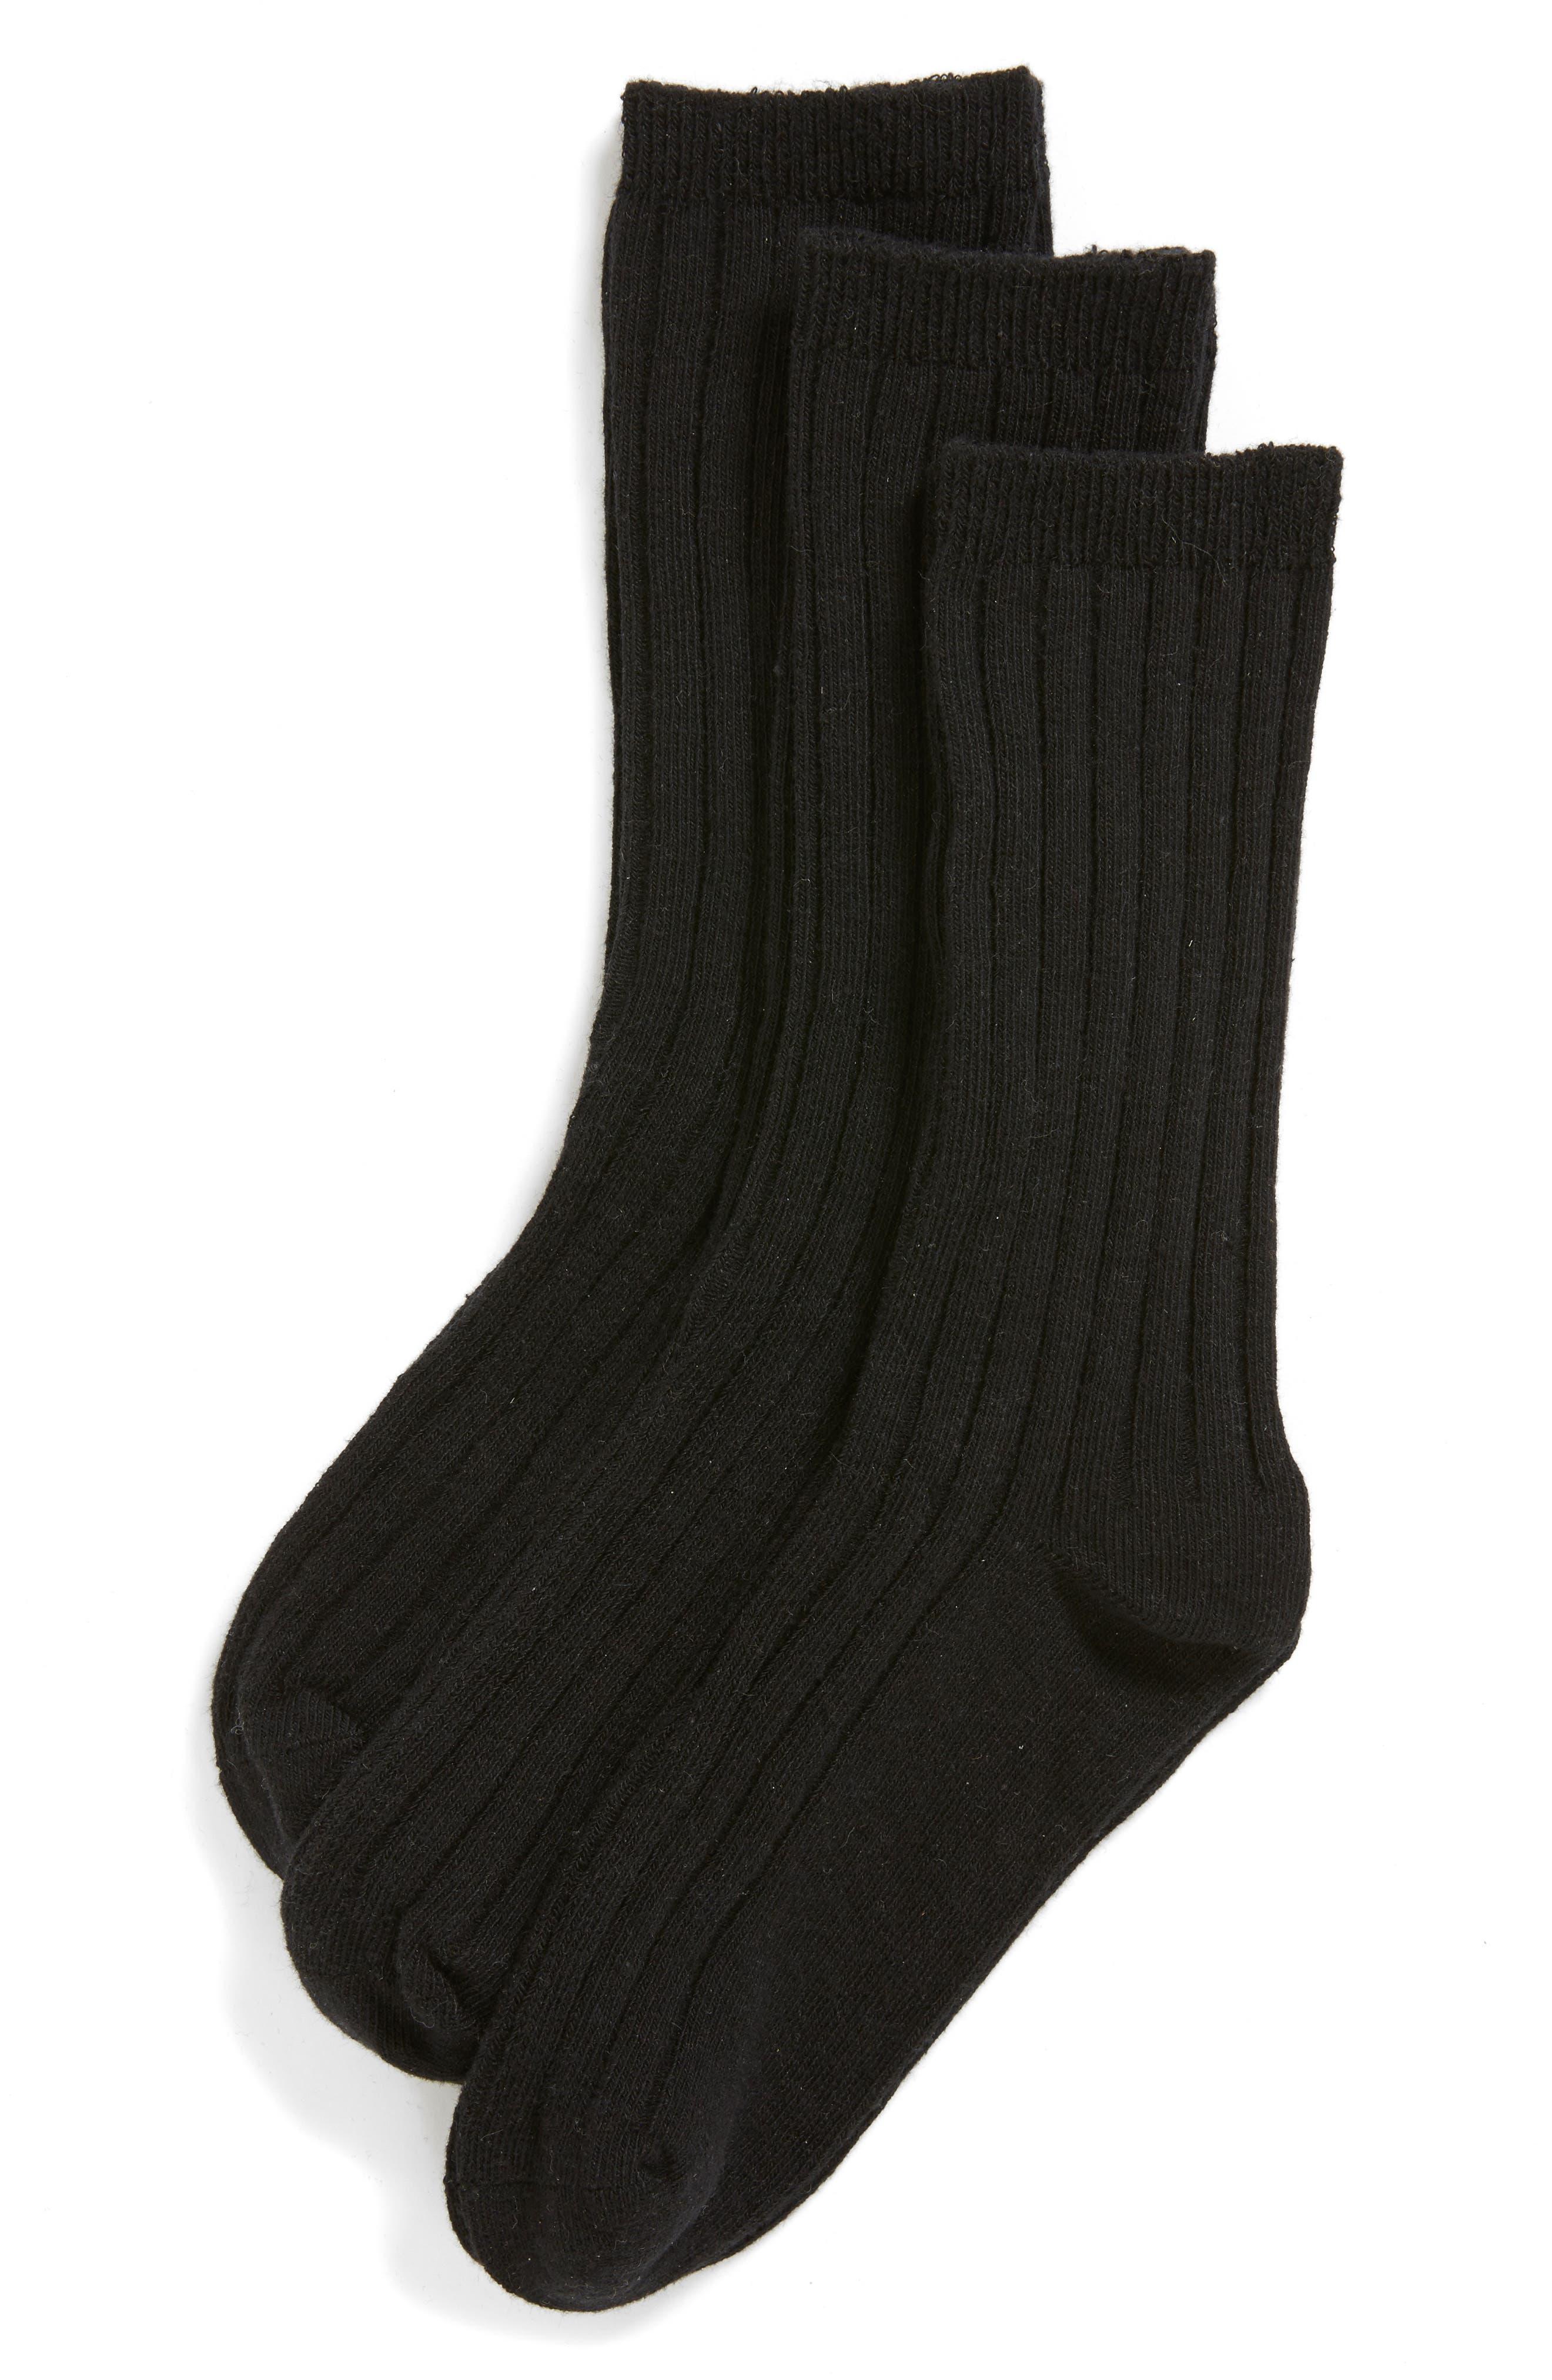 TUCKER + TATE 3-Pack Dress Socks, Main, color, BLACK